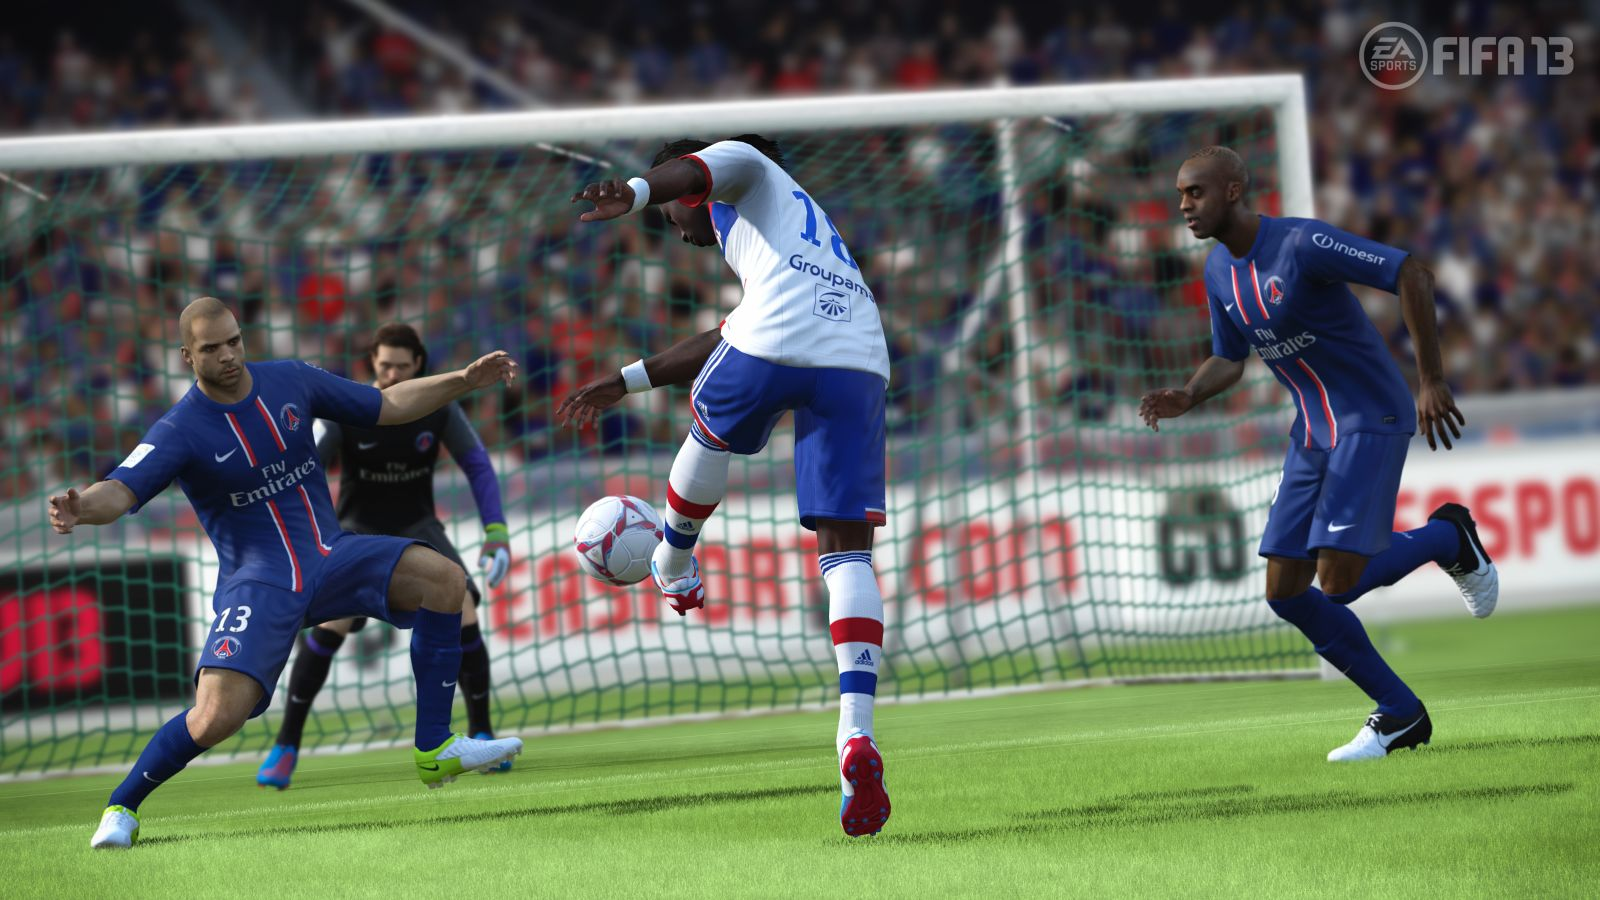 FIFA 13 – fotbálek jedna báseň 70582